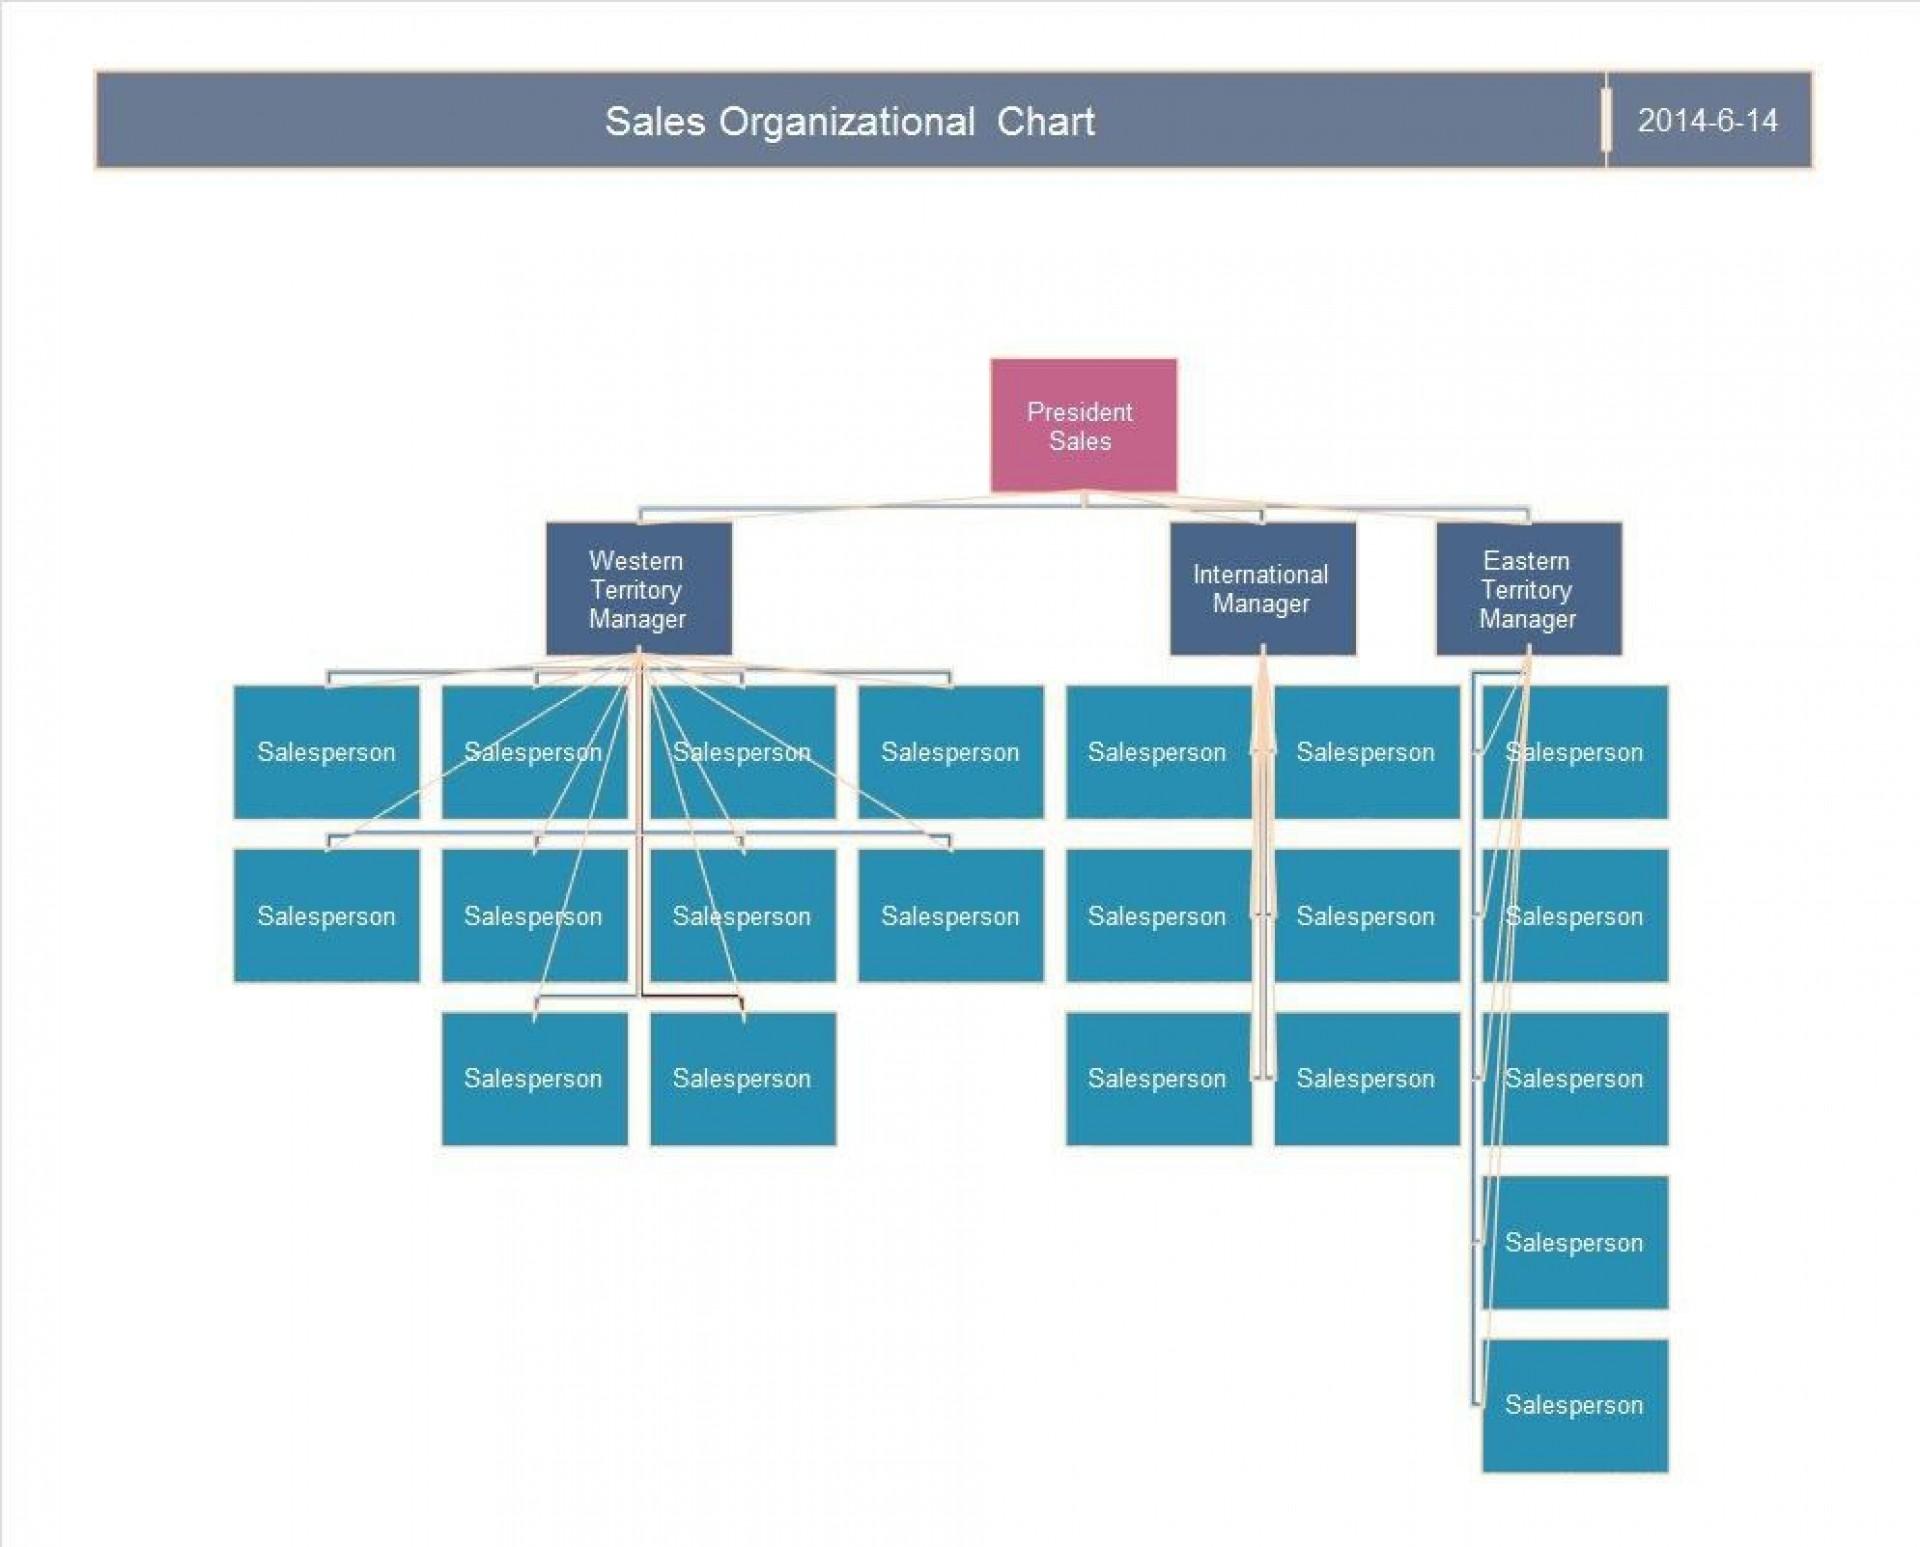 007 Surprising Microsoft Organisation Chart Template High Resolution  Visio Organization Excel Office1920